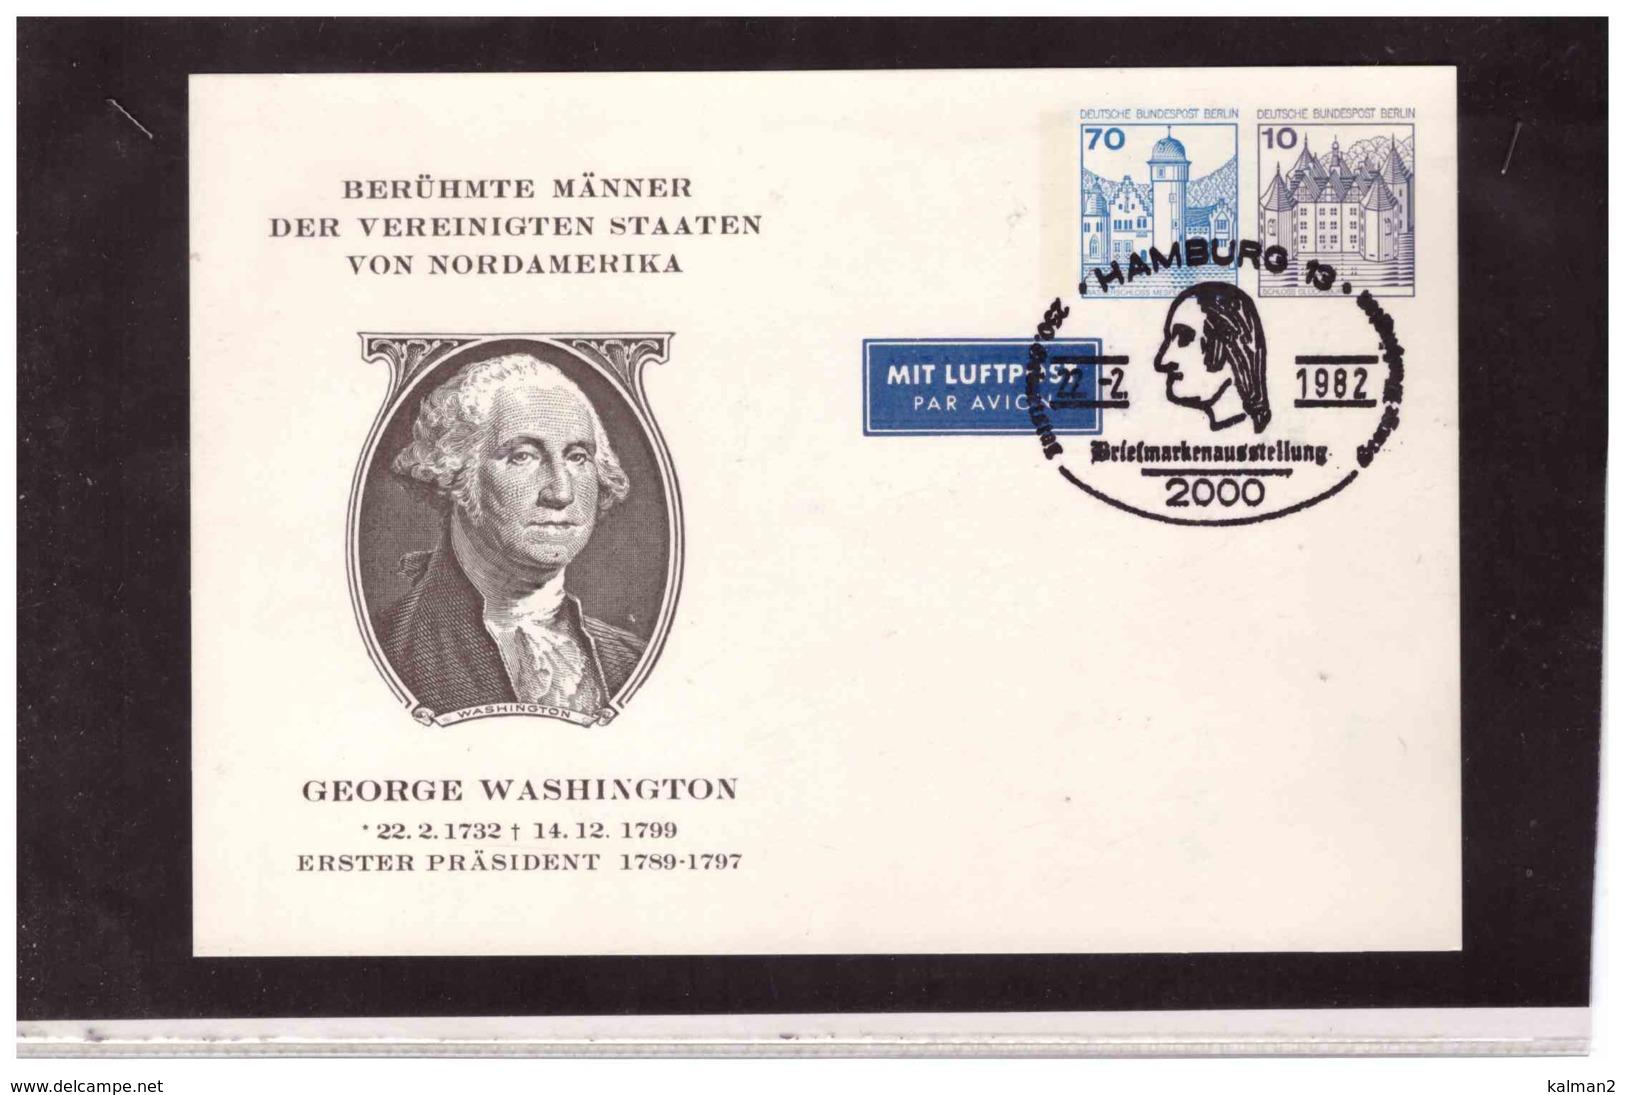 DE2461   -  HAMBURG  22.2.1982   /    ENTIRE  BERLIN FRANKED WITH 70+10  C. - George Washington